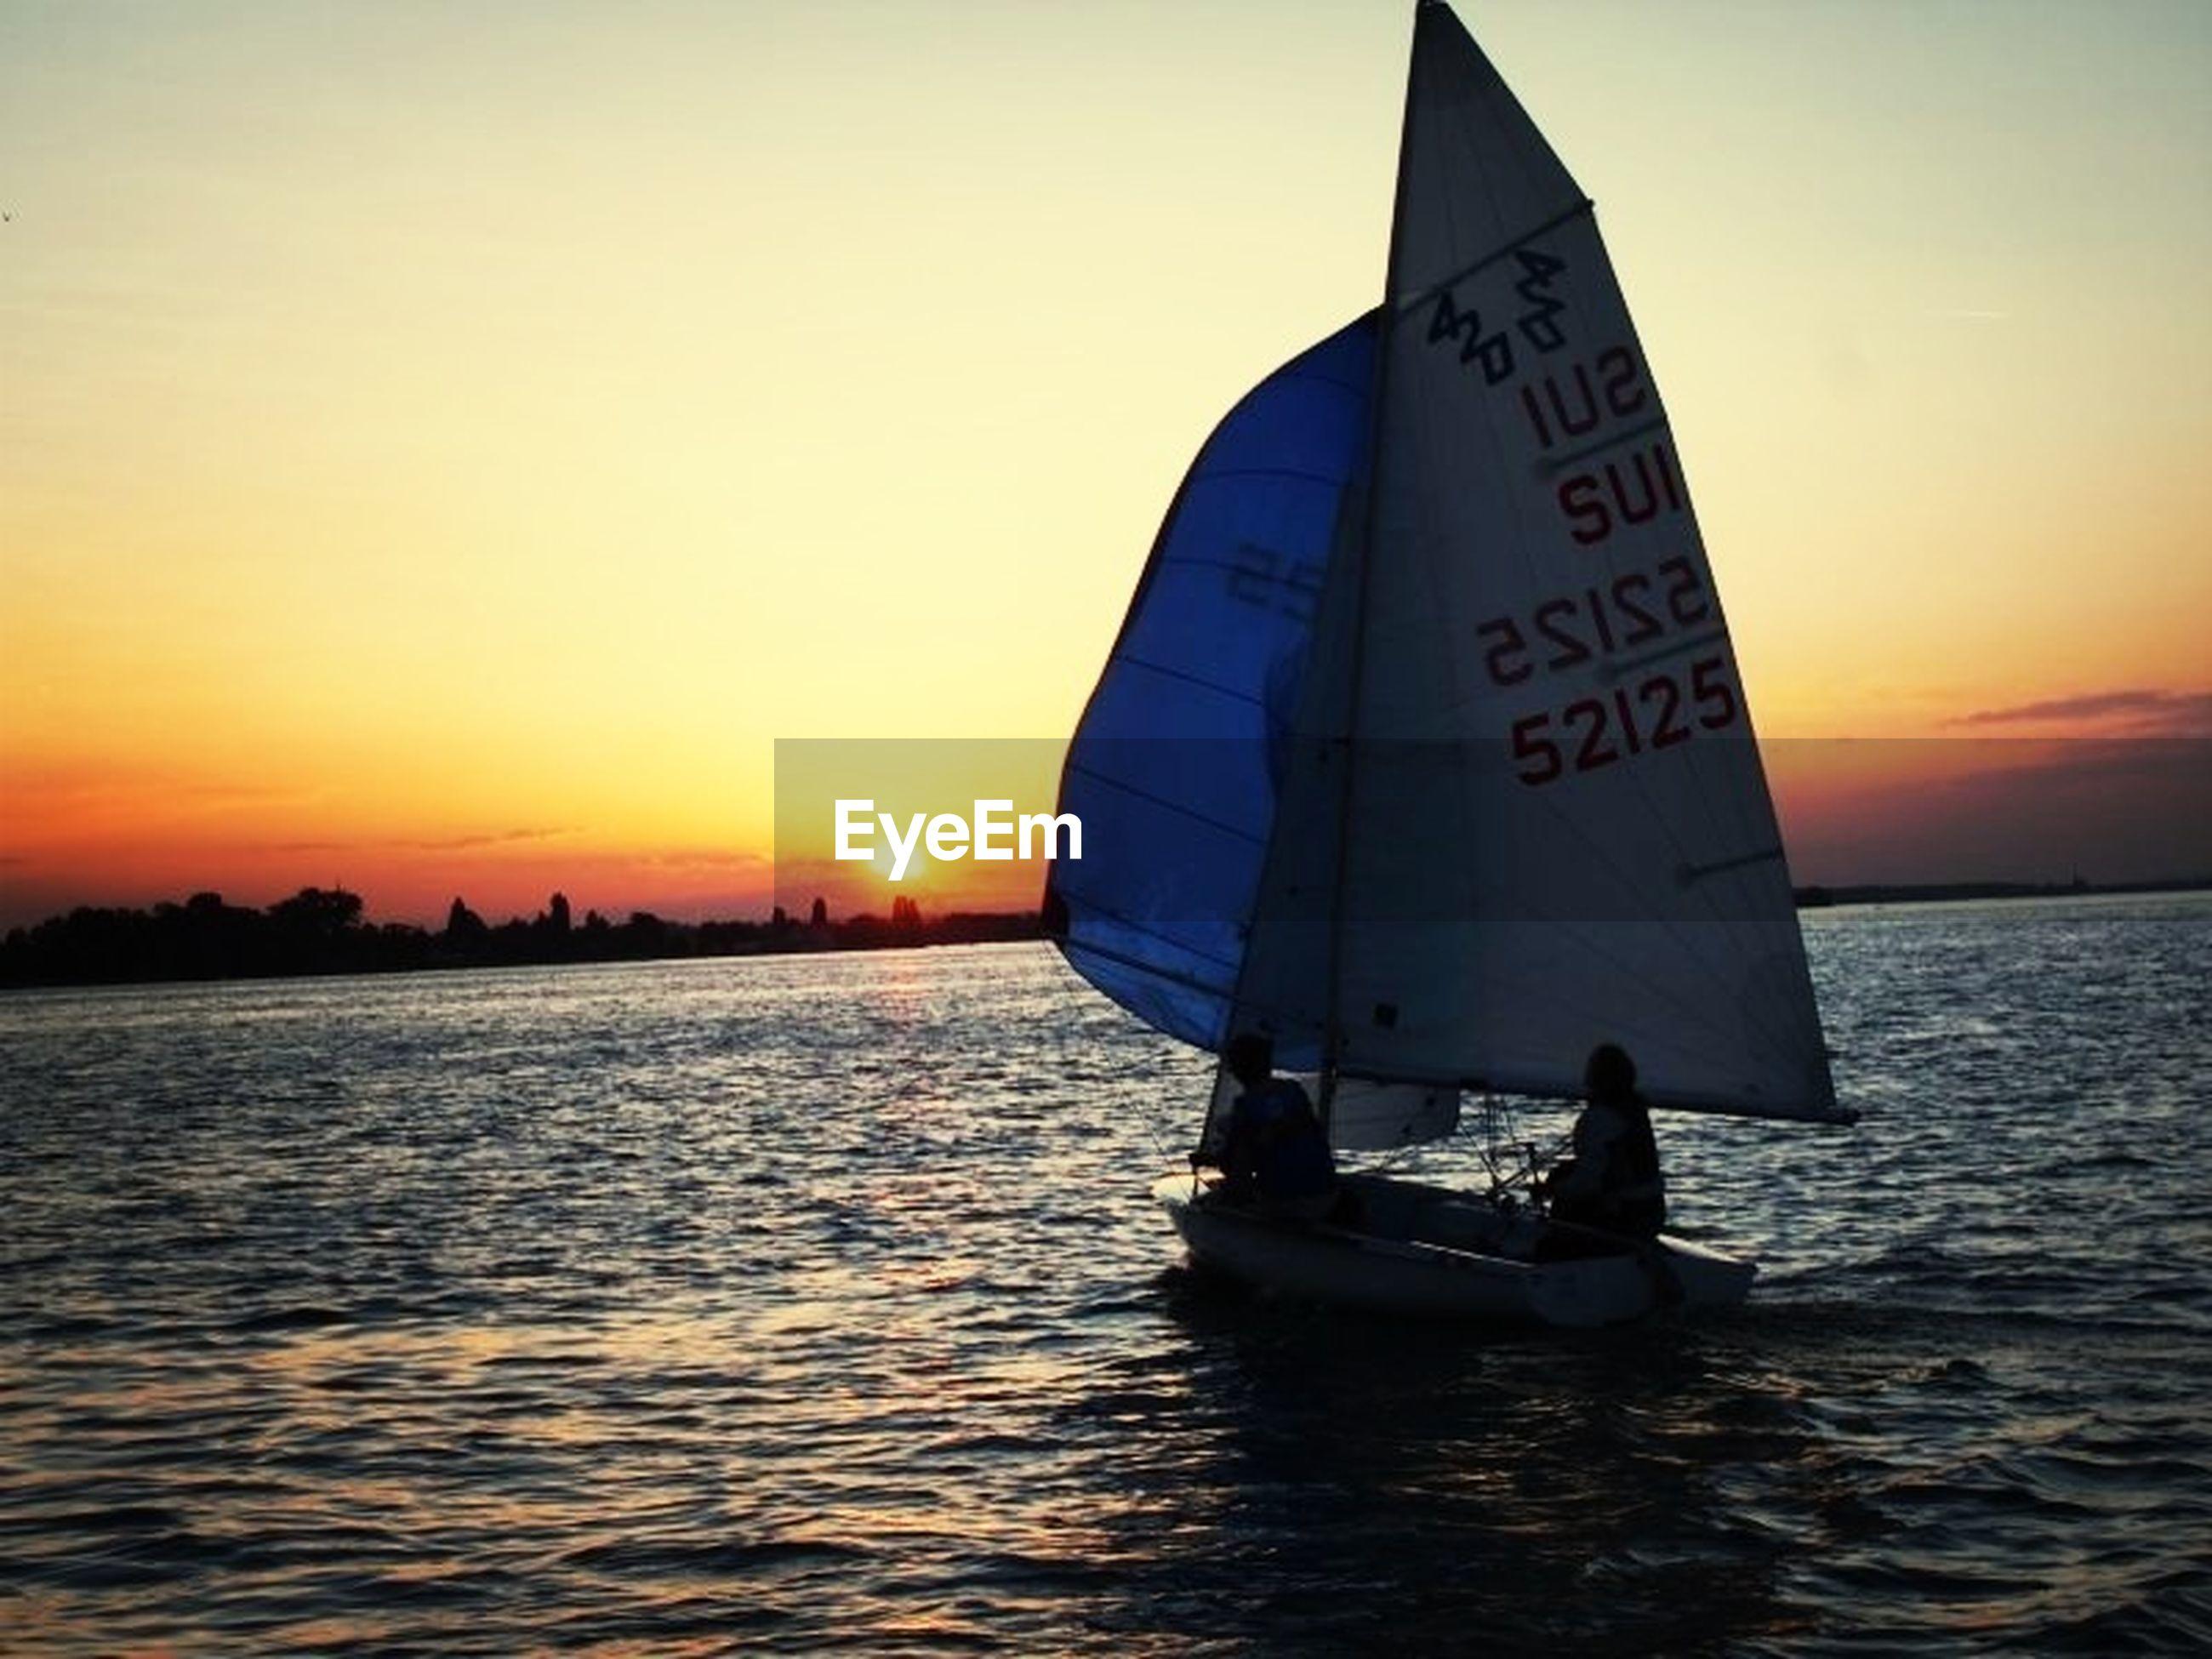 sunset, sea, water, transportation, nautical vessel, mode of transport, waterfront, boat, sky, orange color, horizon over water, sailing, rippled, scenics, men, travel, sun, silhouette